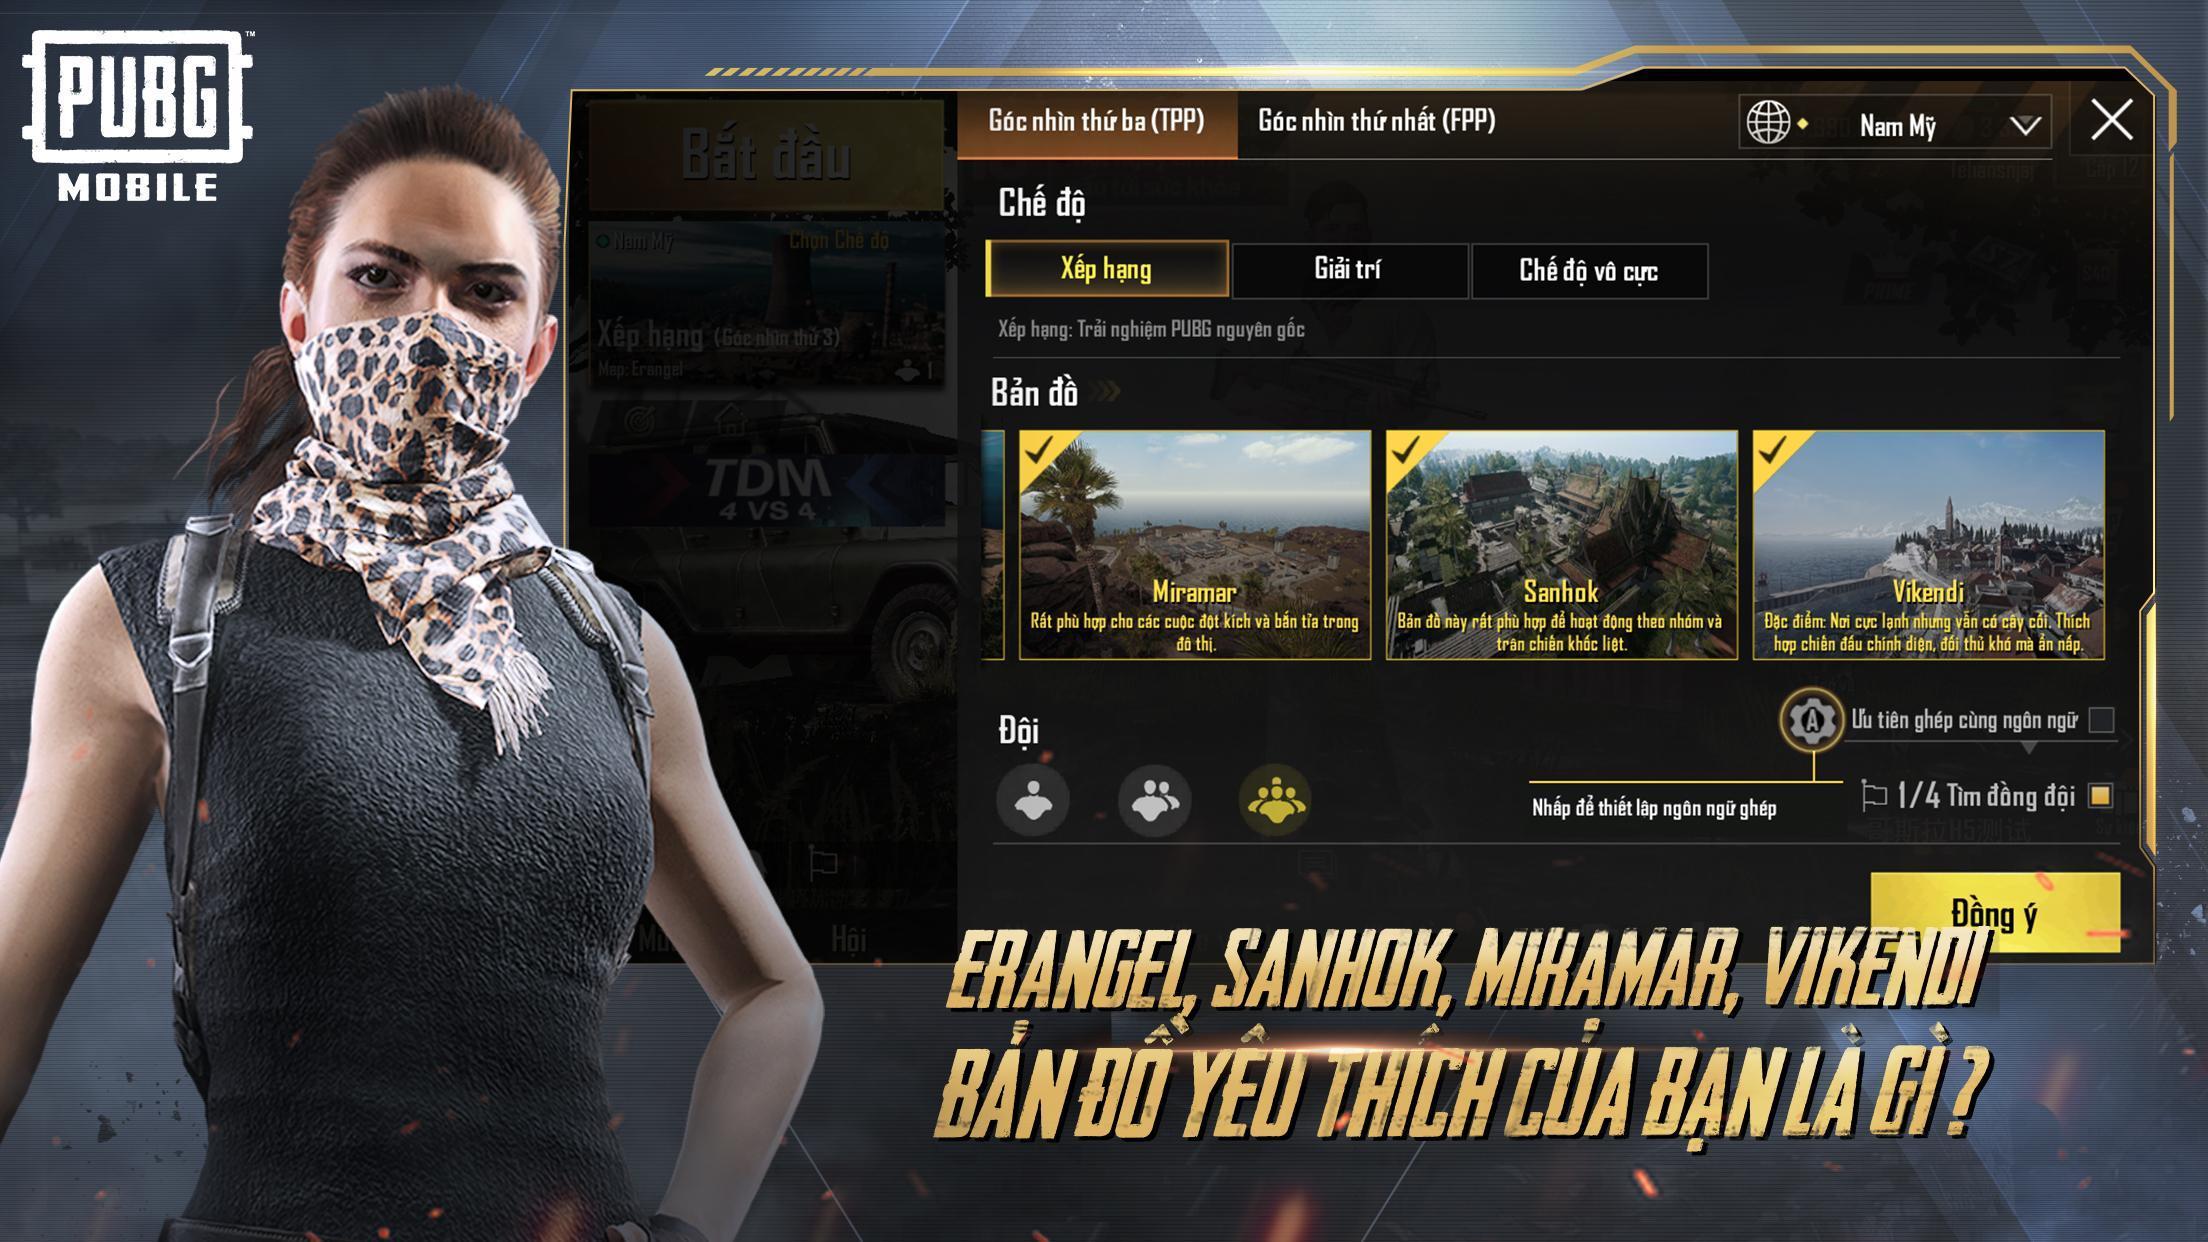 Download gam PUBG MOBILE